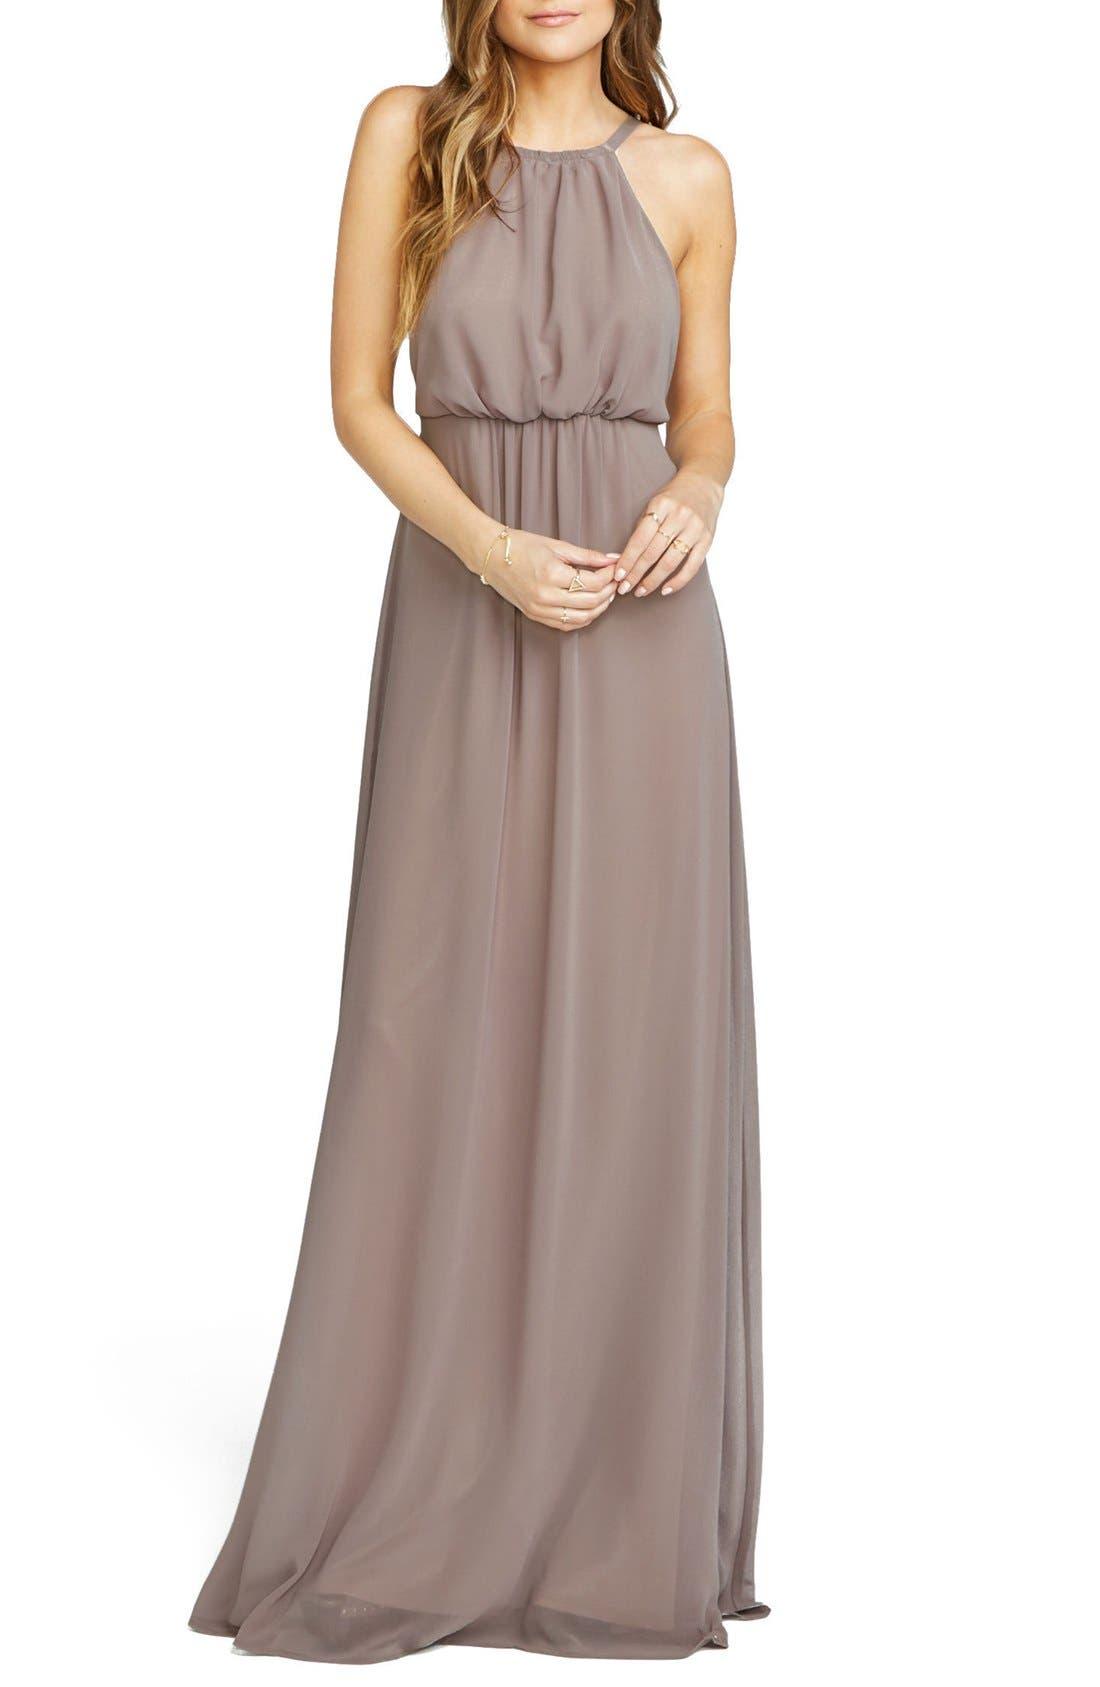 Alternate Image 1 Selected - Show Me Your Mumu Amanda Open Back Blouson Gown